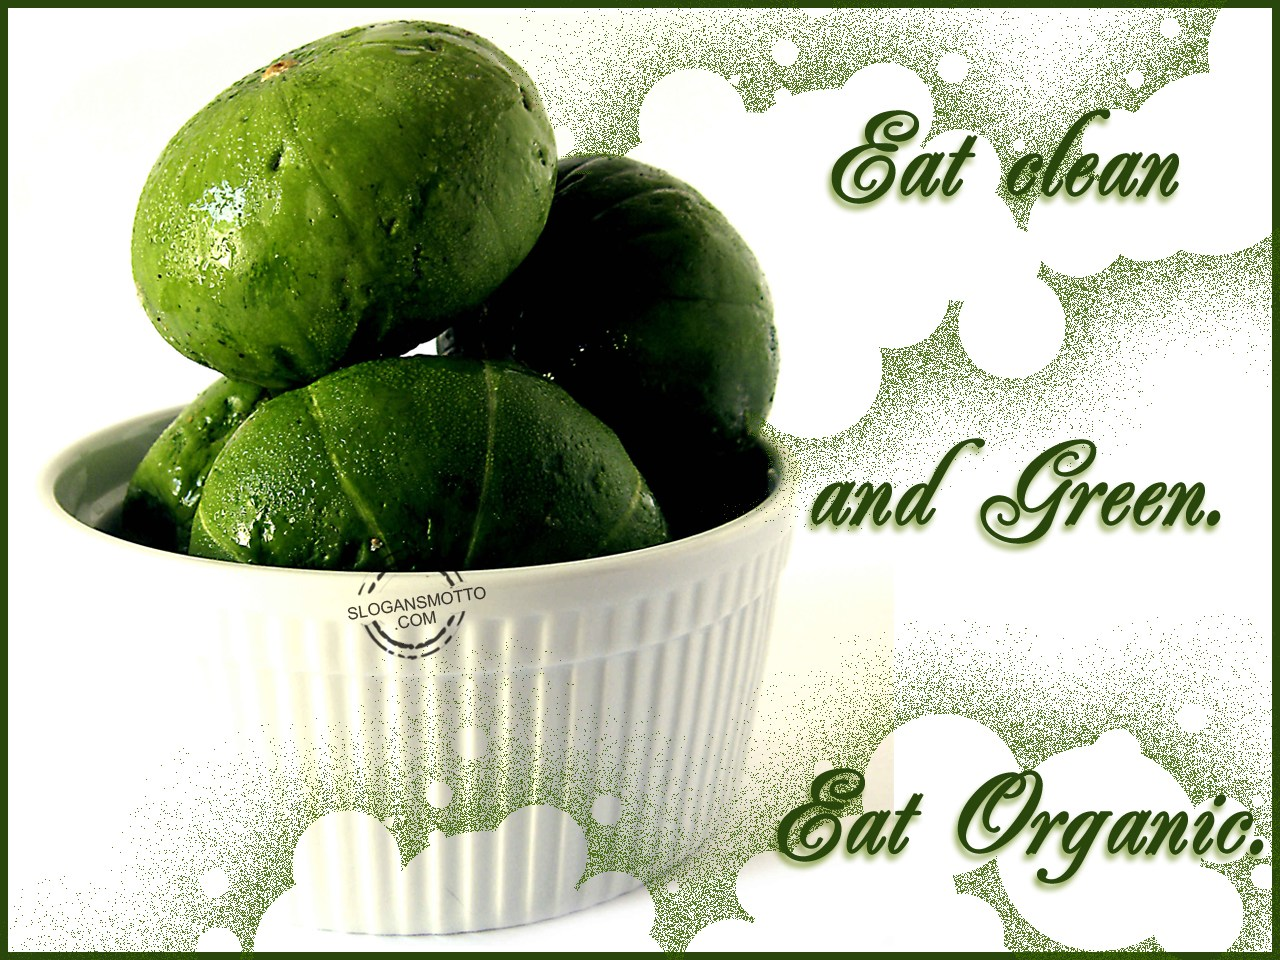 Organic Food Slogans